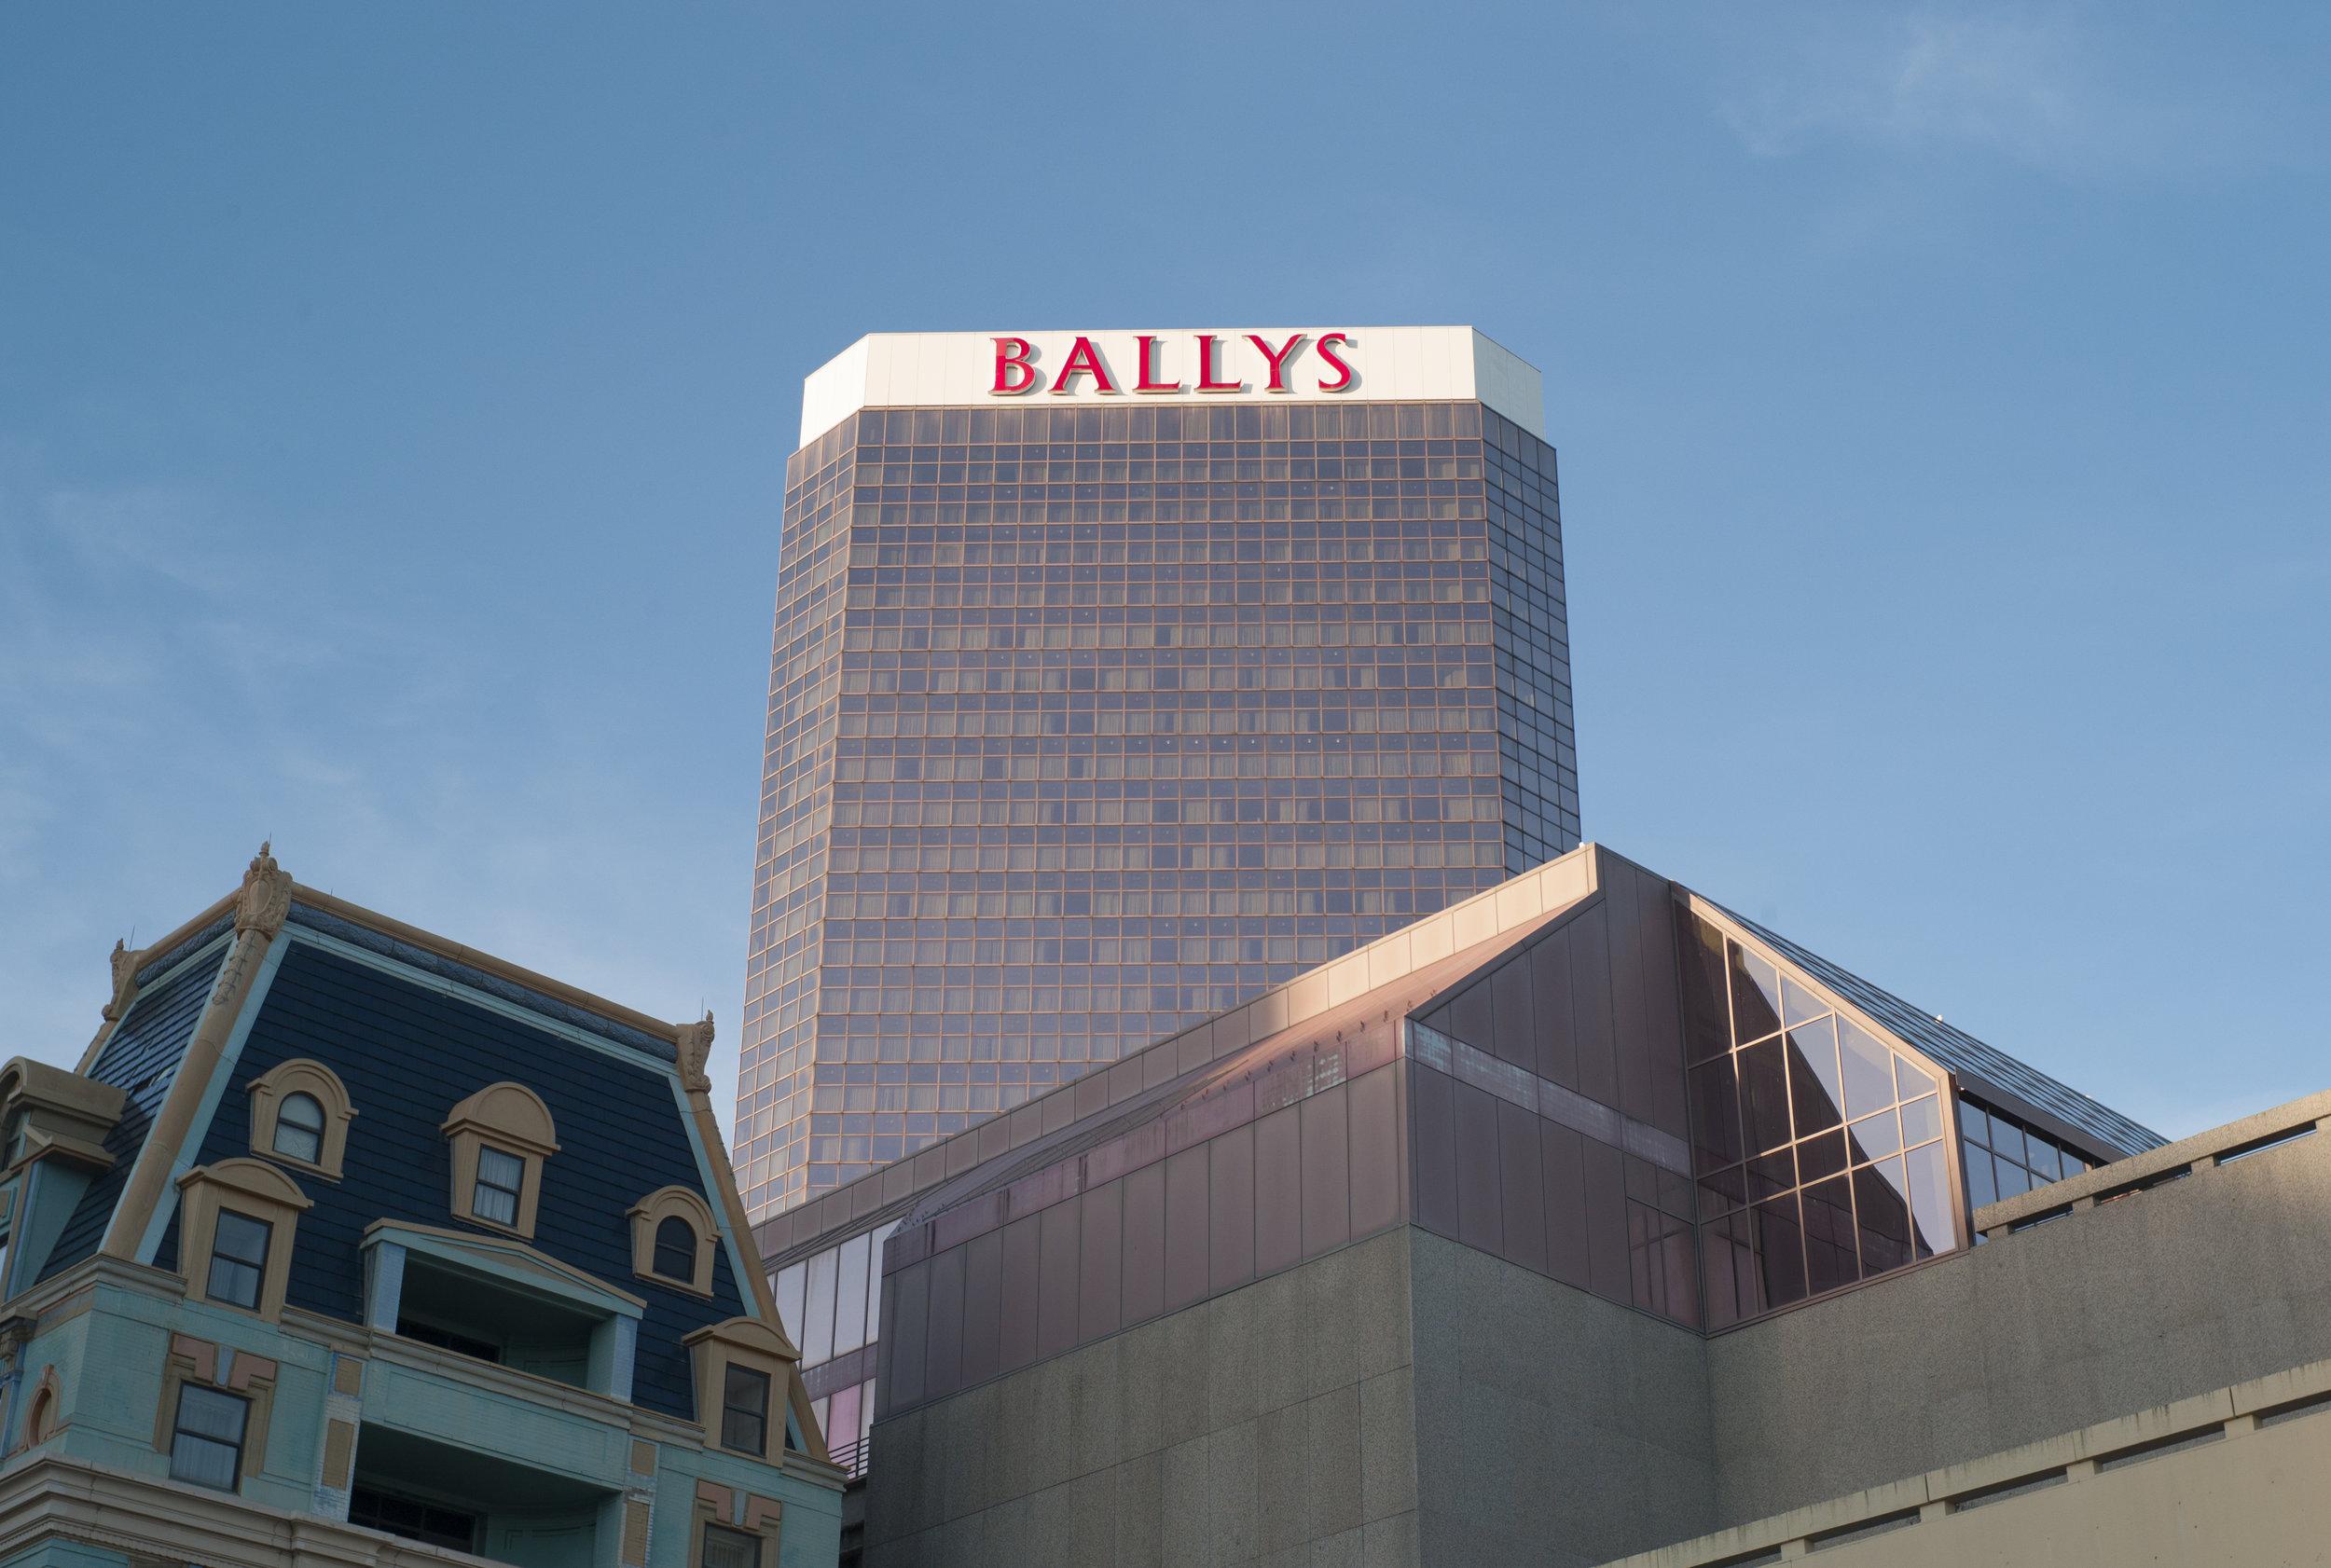 Title: Vacant Rooms Location:Atlantic City, New Jersey Year: 2014 Medium:Chromogenic Color Print